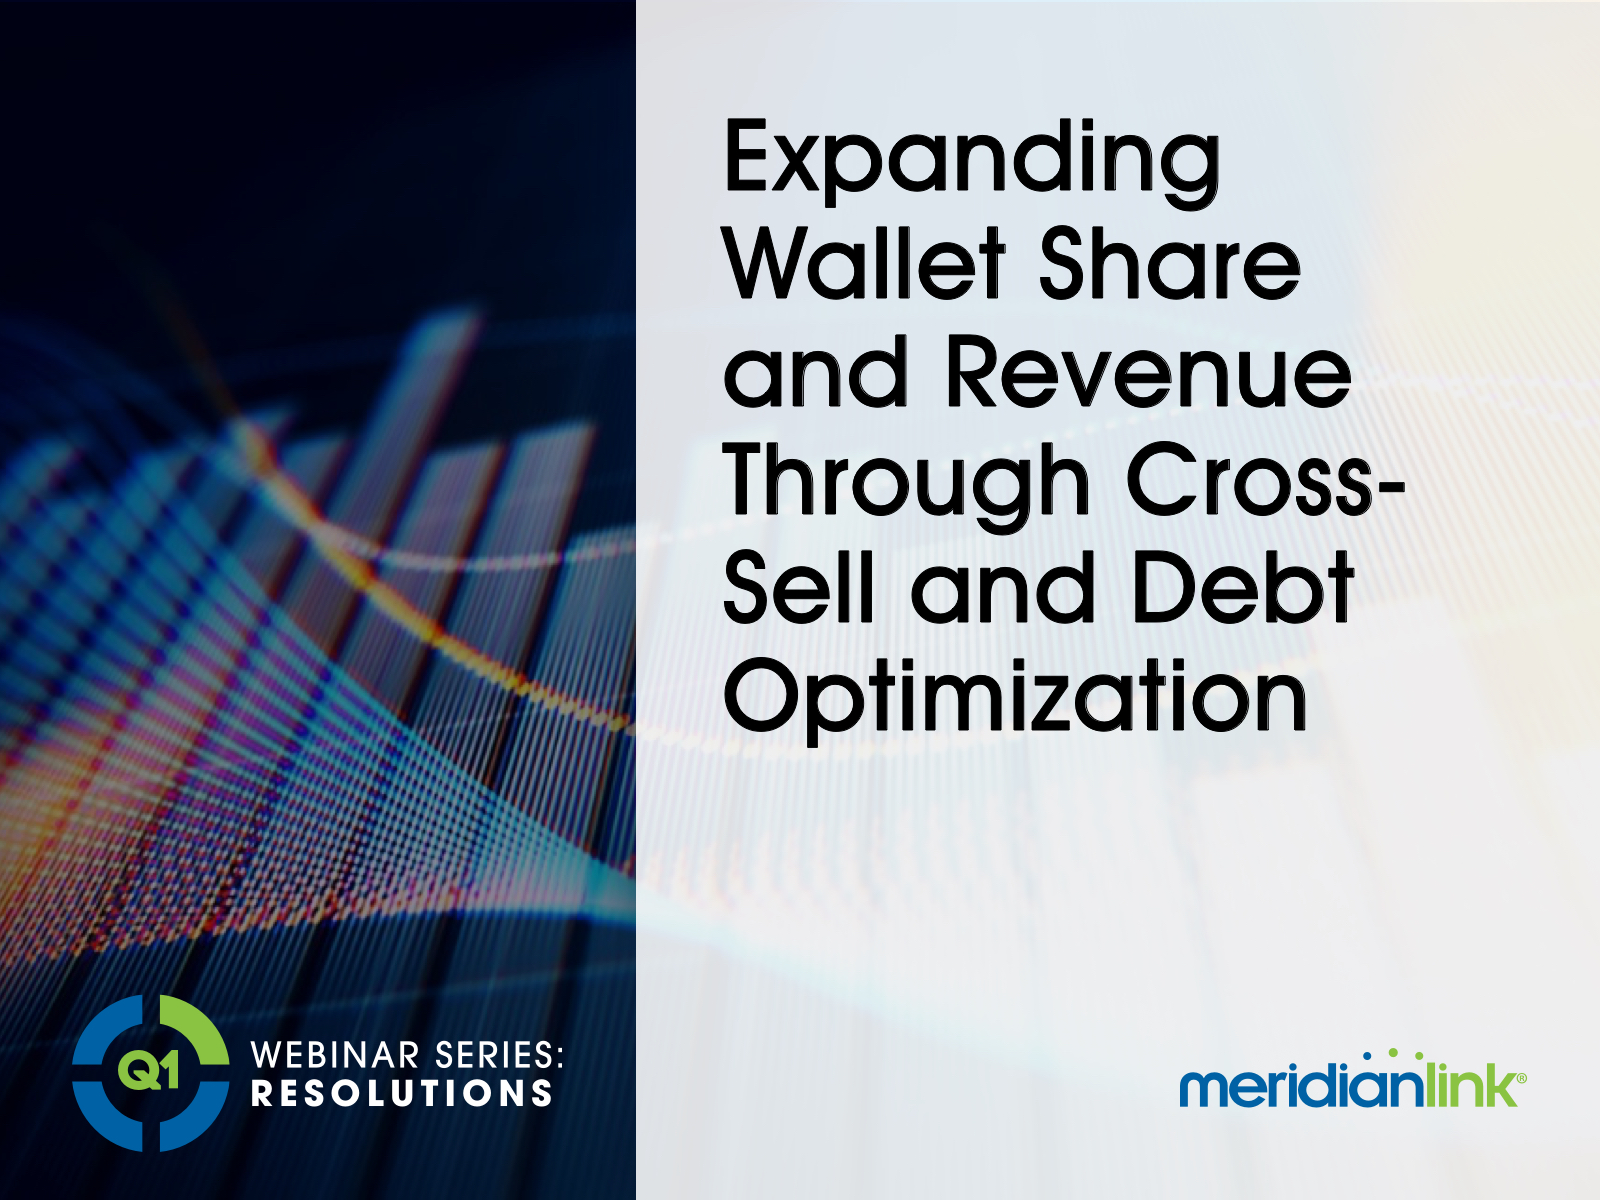 q1-webinar-expanding-wallet-share-revenue-cross-sell